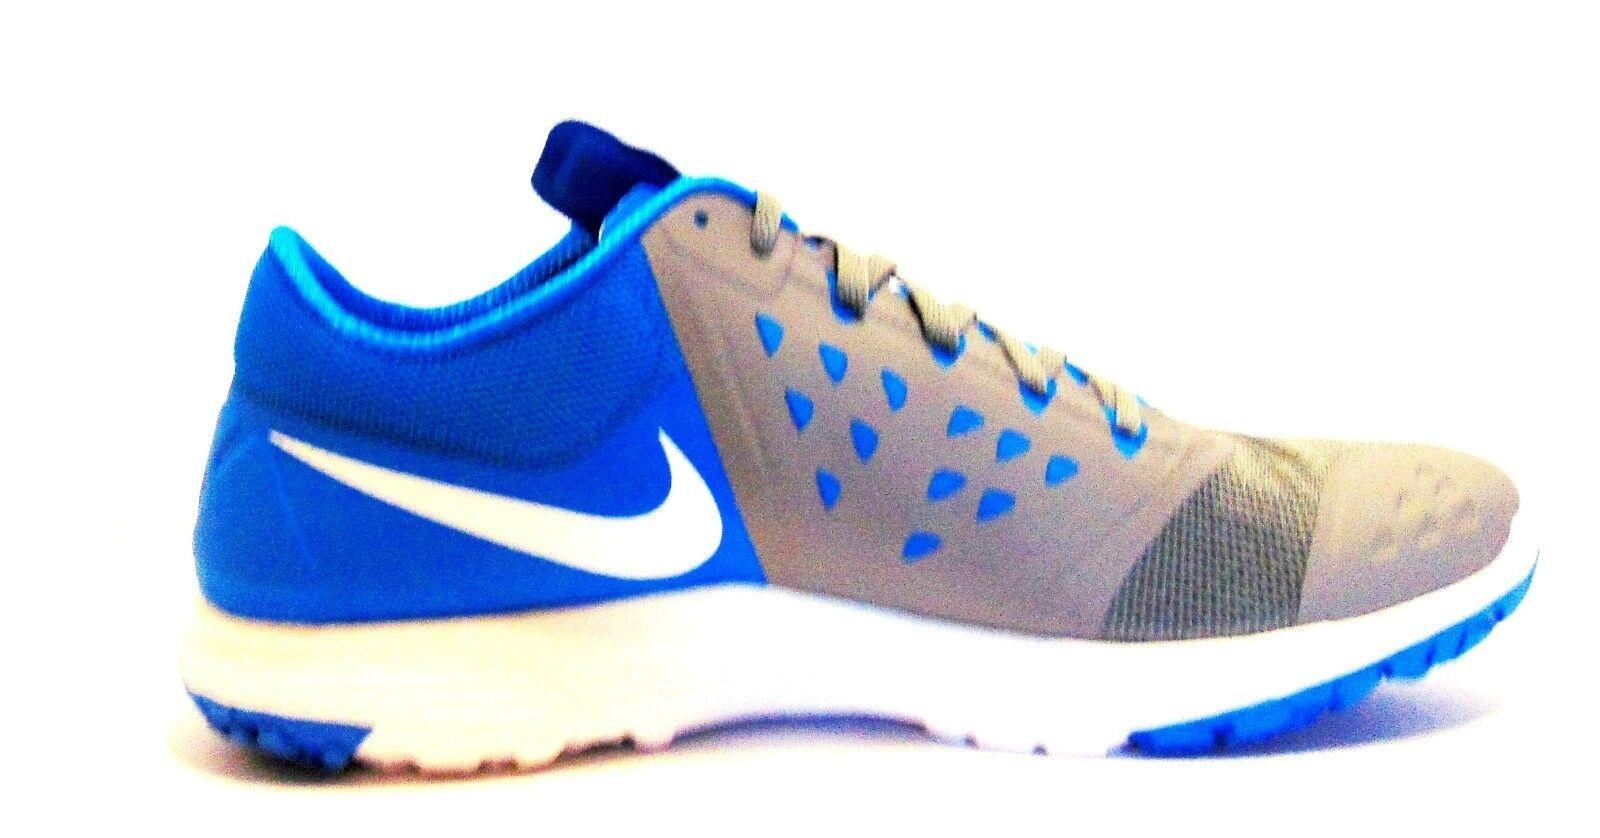 Nike Men's FS Lite Trainer Trainer Trainer II Cross Trainer Grey Photo bluee 52ffef